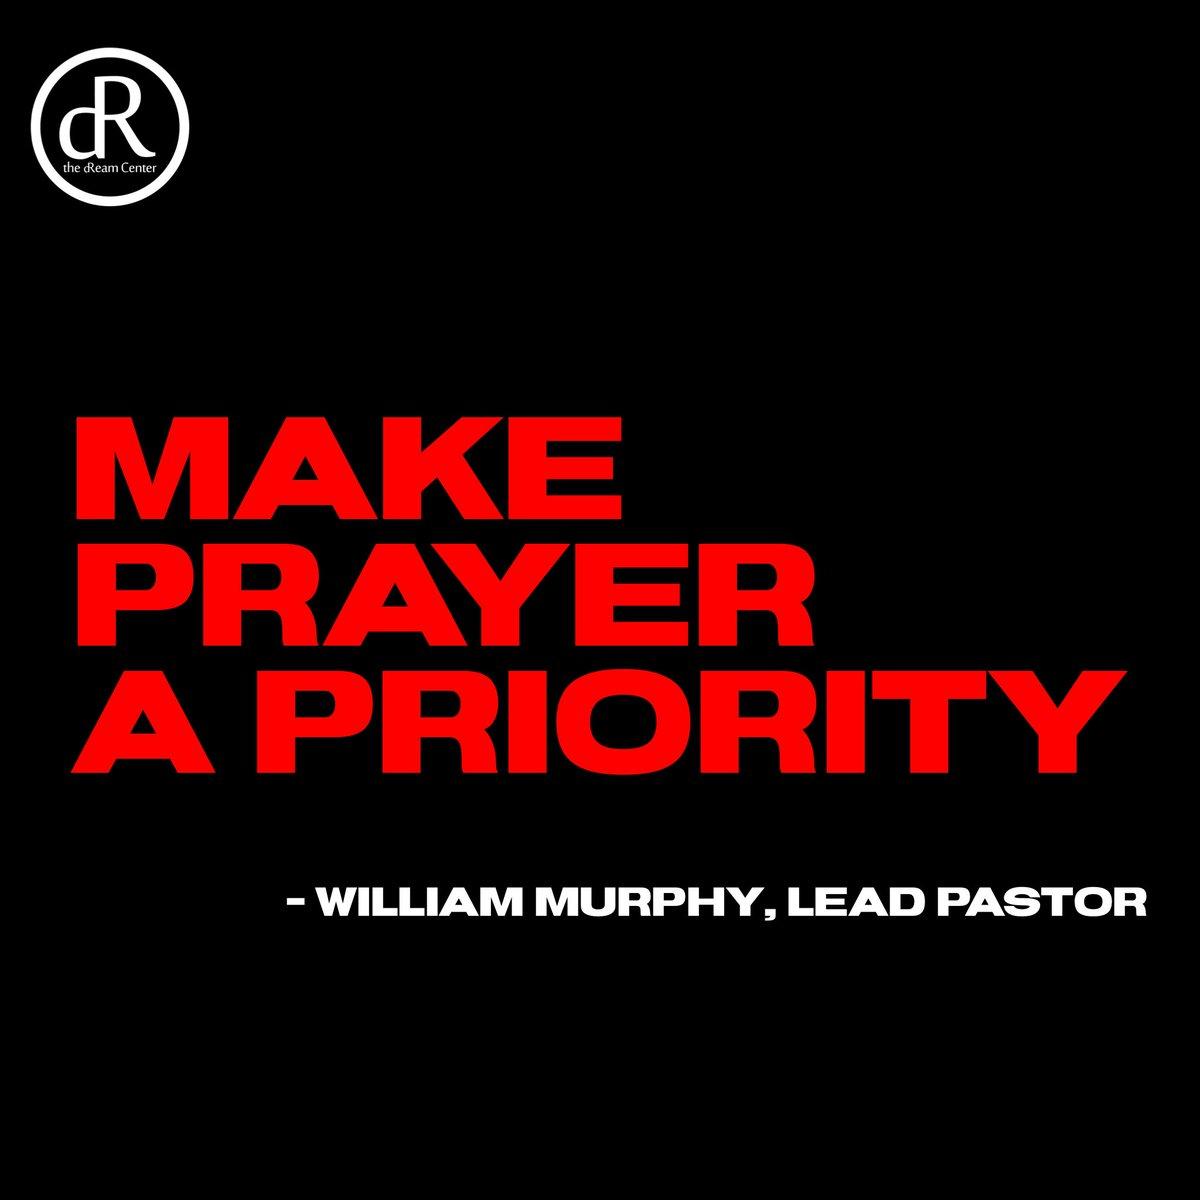 """Make PRAYER a PRIORITY!"" - @pastormurph , Lead Pastor  #dReamcenteratl #williammurphy #atlantachurch #getUP #rightNOW #doIT #prayingthroughit #prayerchangesthingspic.twitter.com/11n9GJ6dXH"